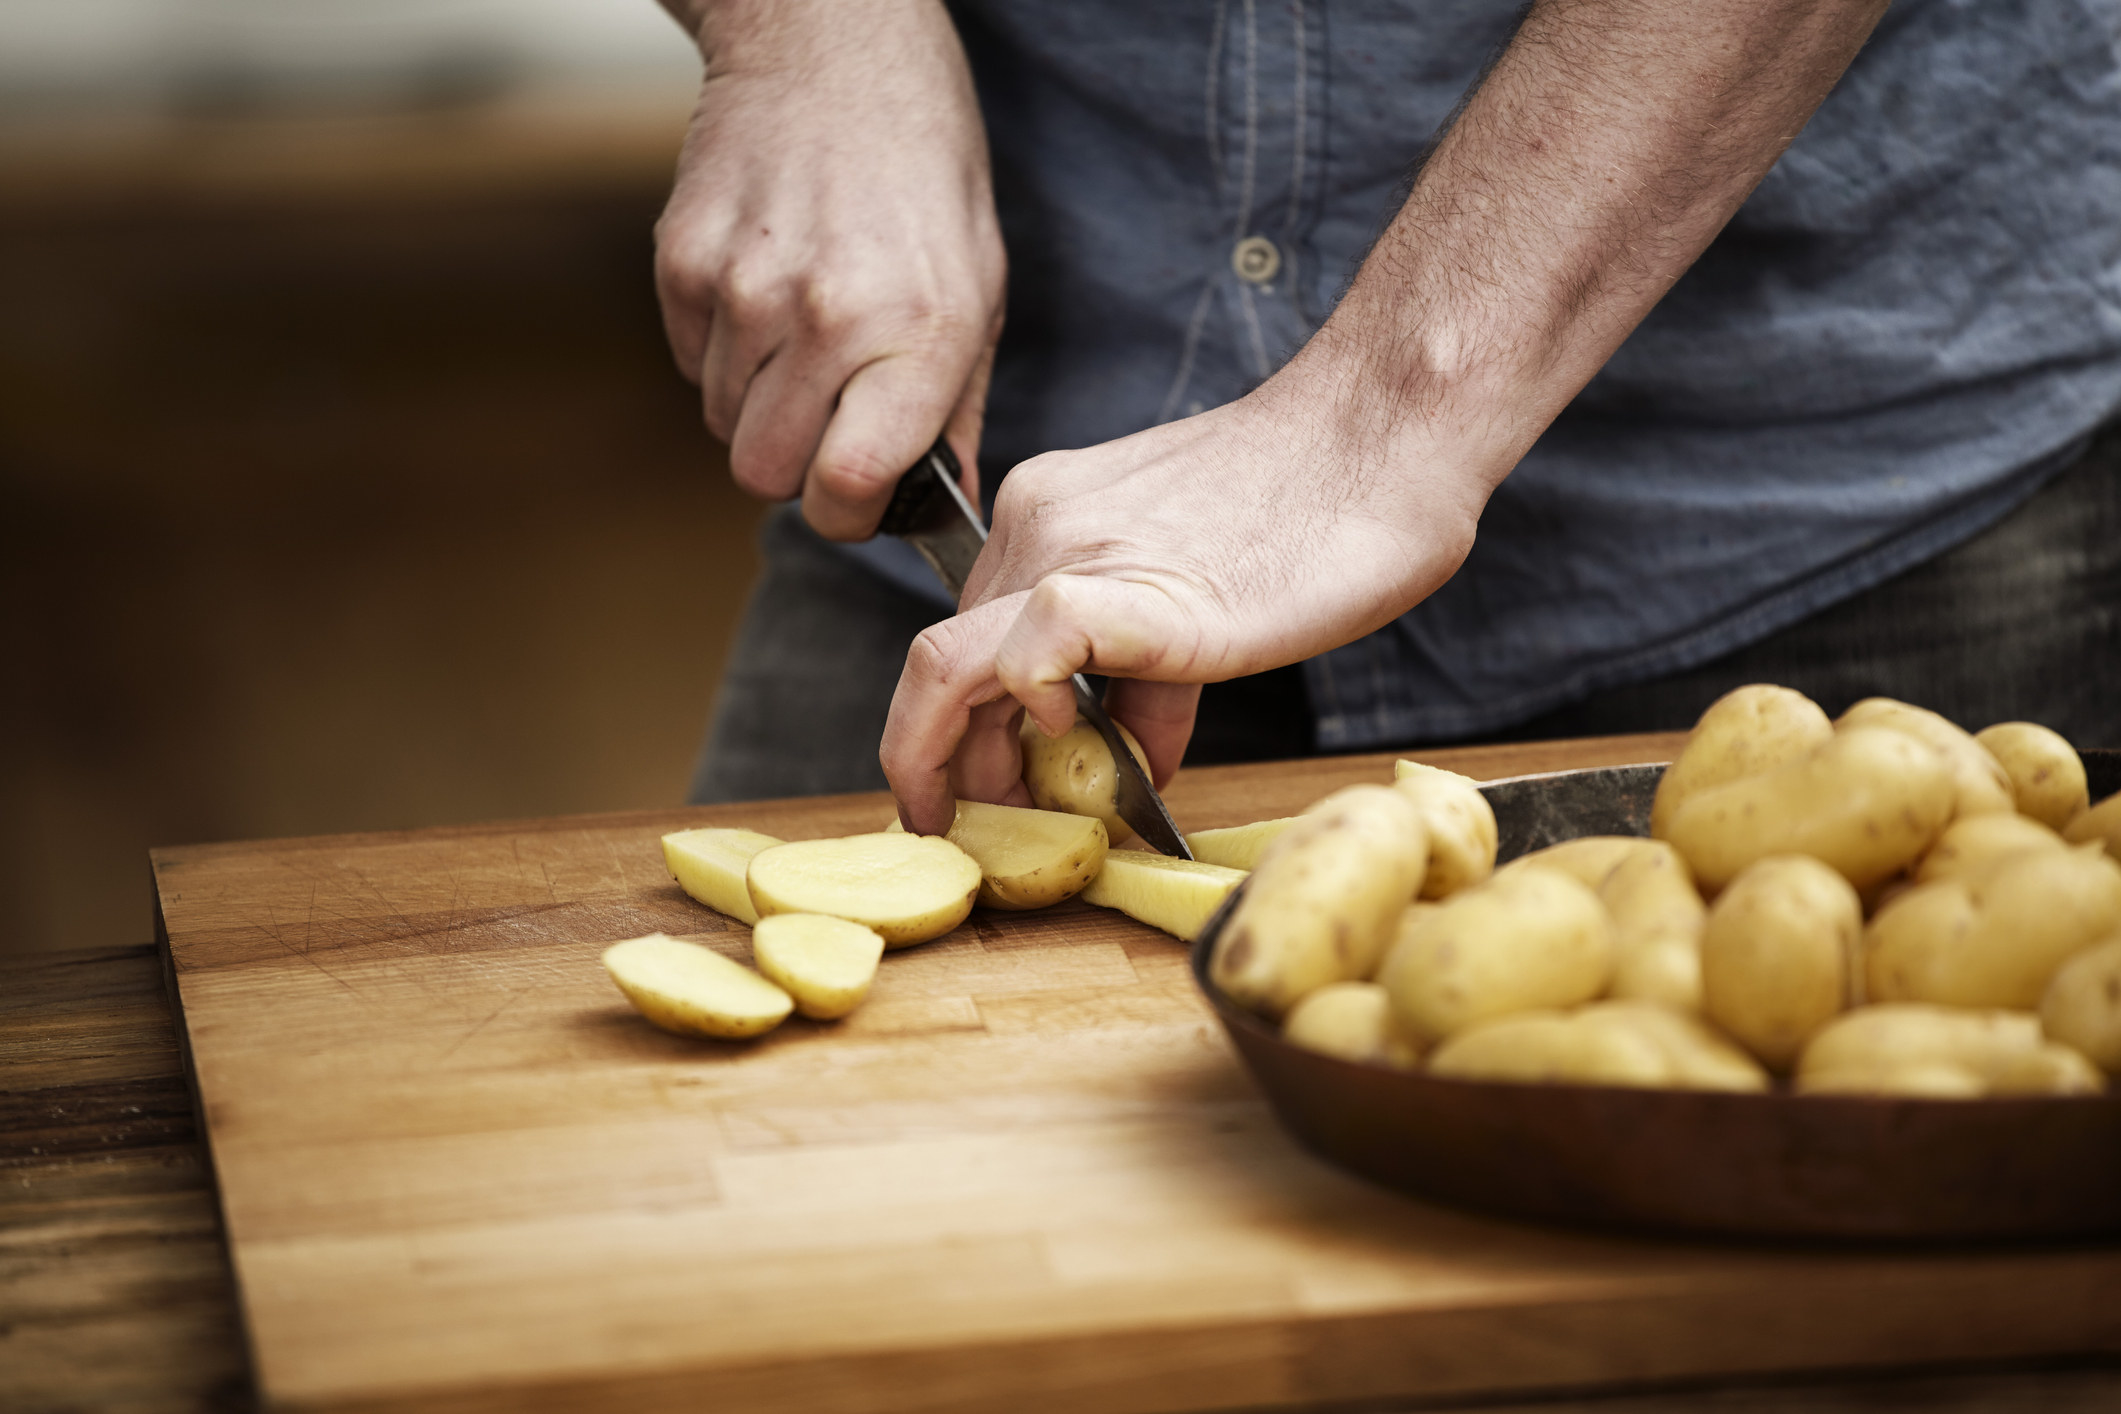 hand cutting potatoes